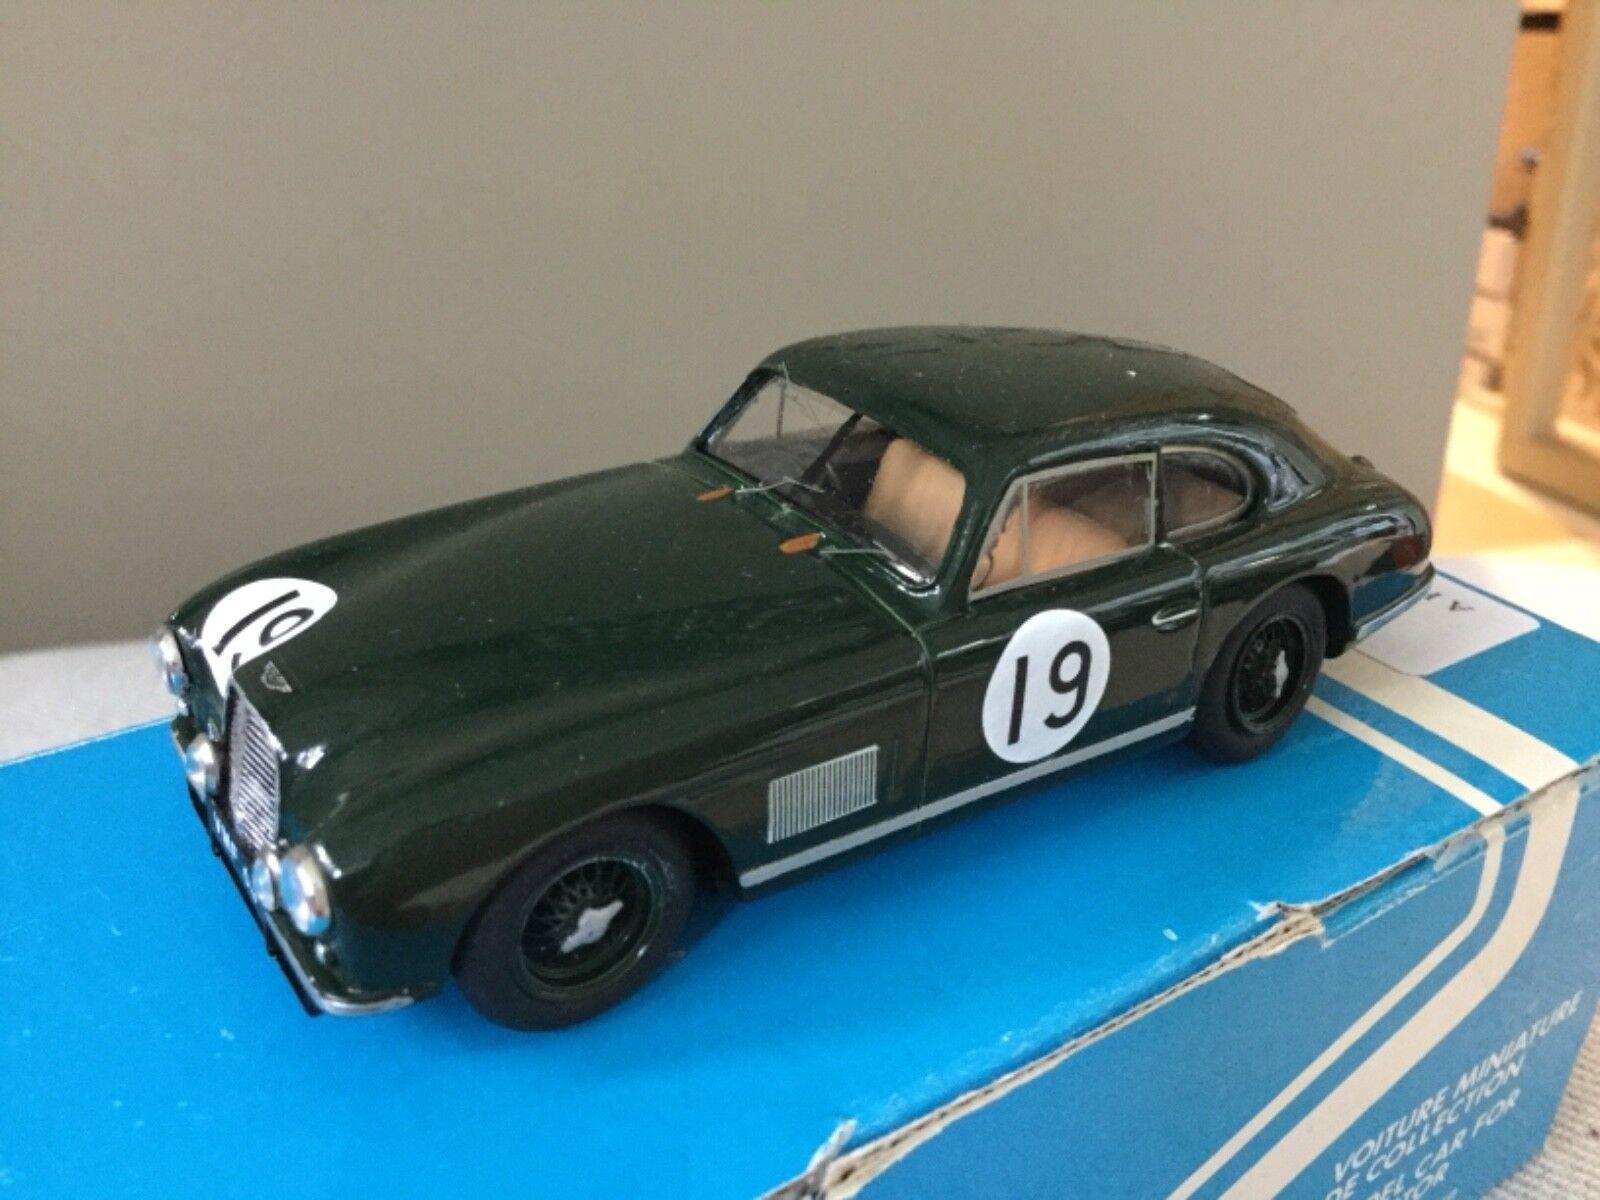 precios bajos Aston Martin db2   kit kit kit montato provance  Le Mans 1950 1 43  envío gratuito a nivel mundial